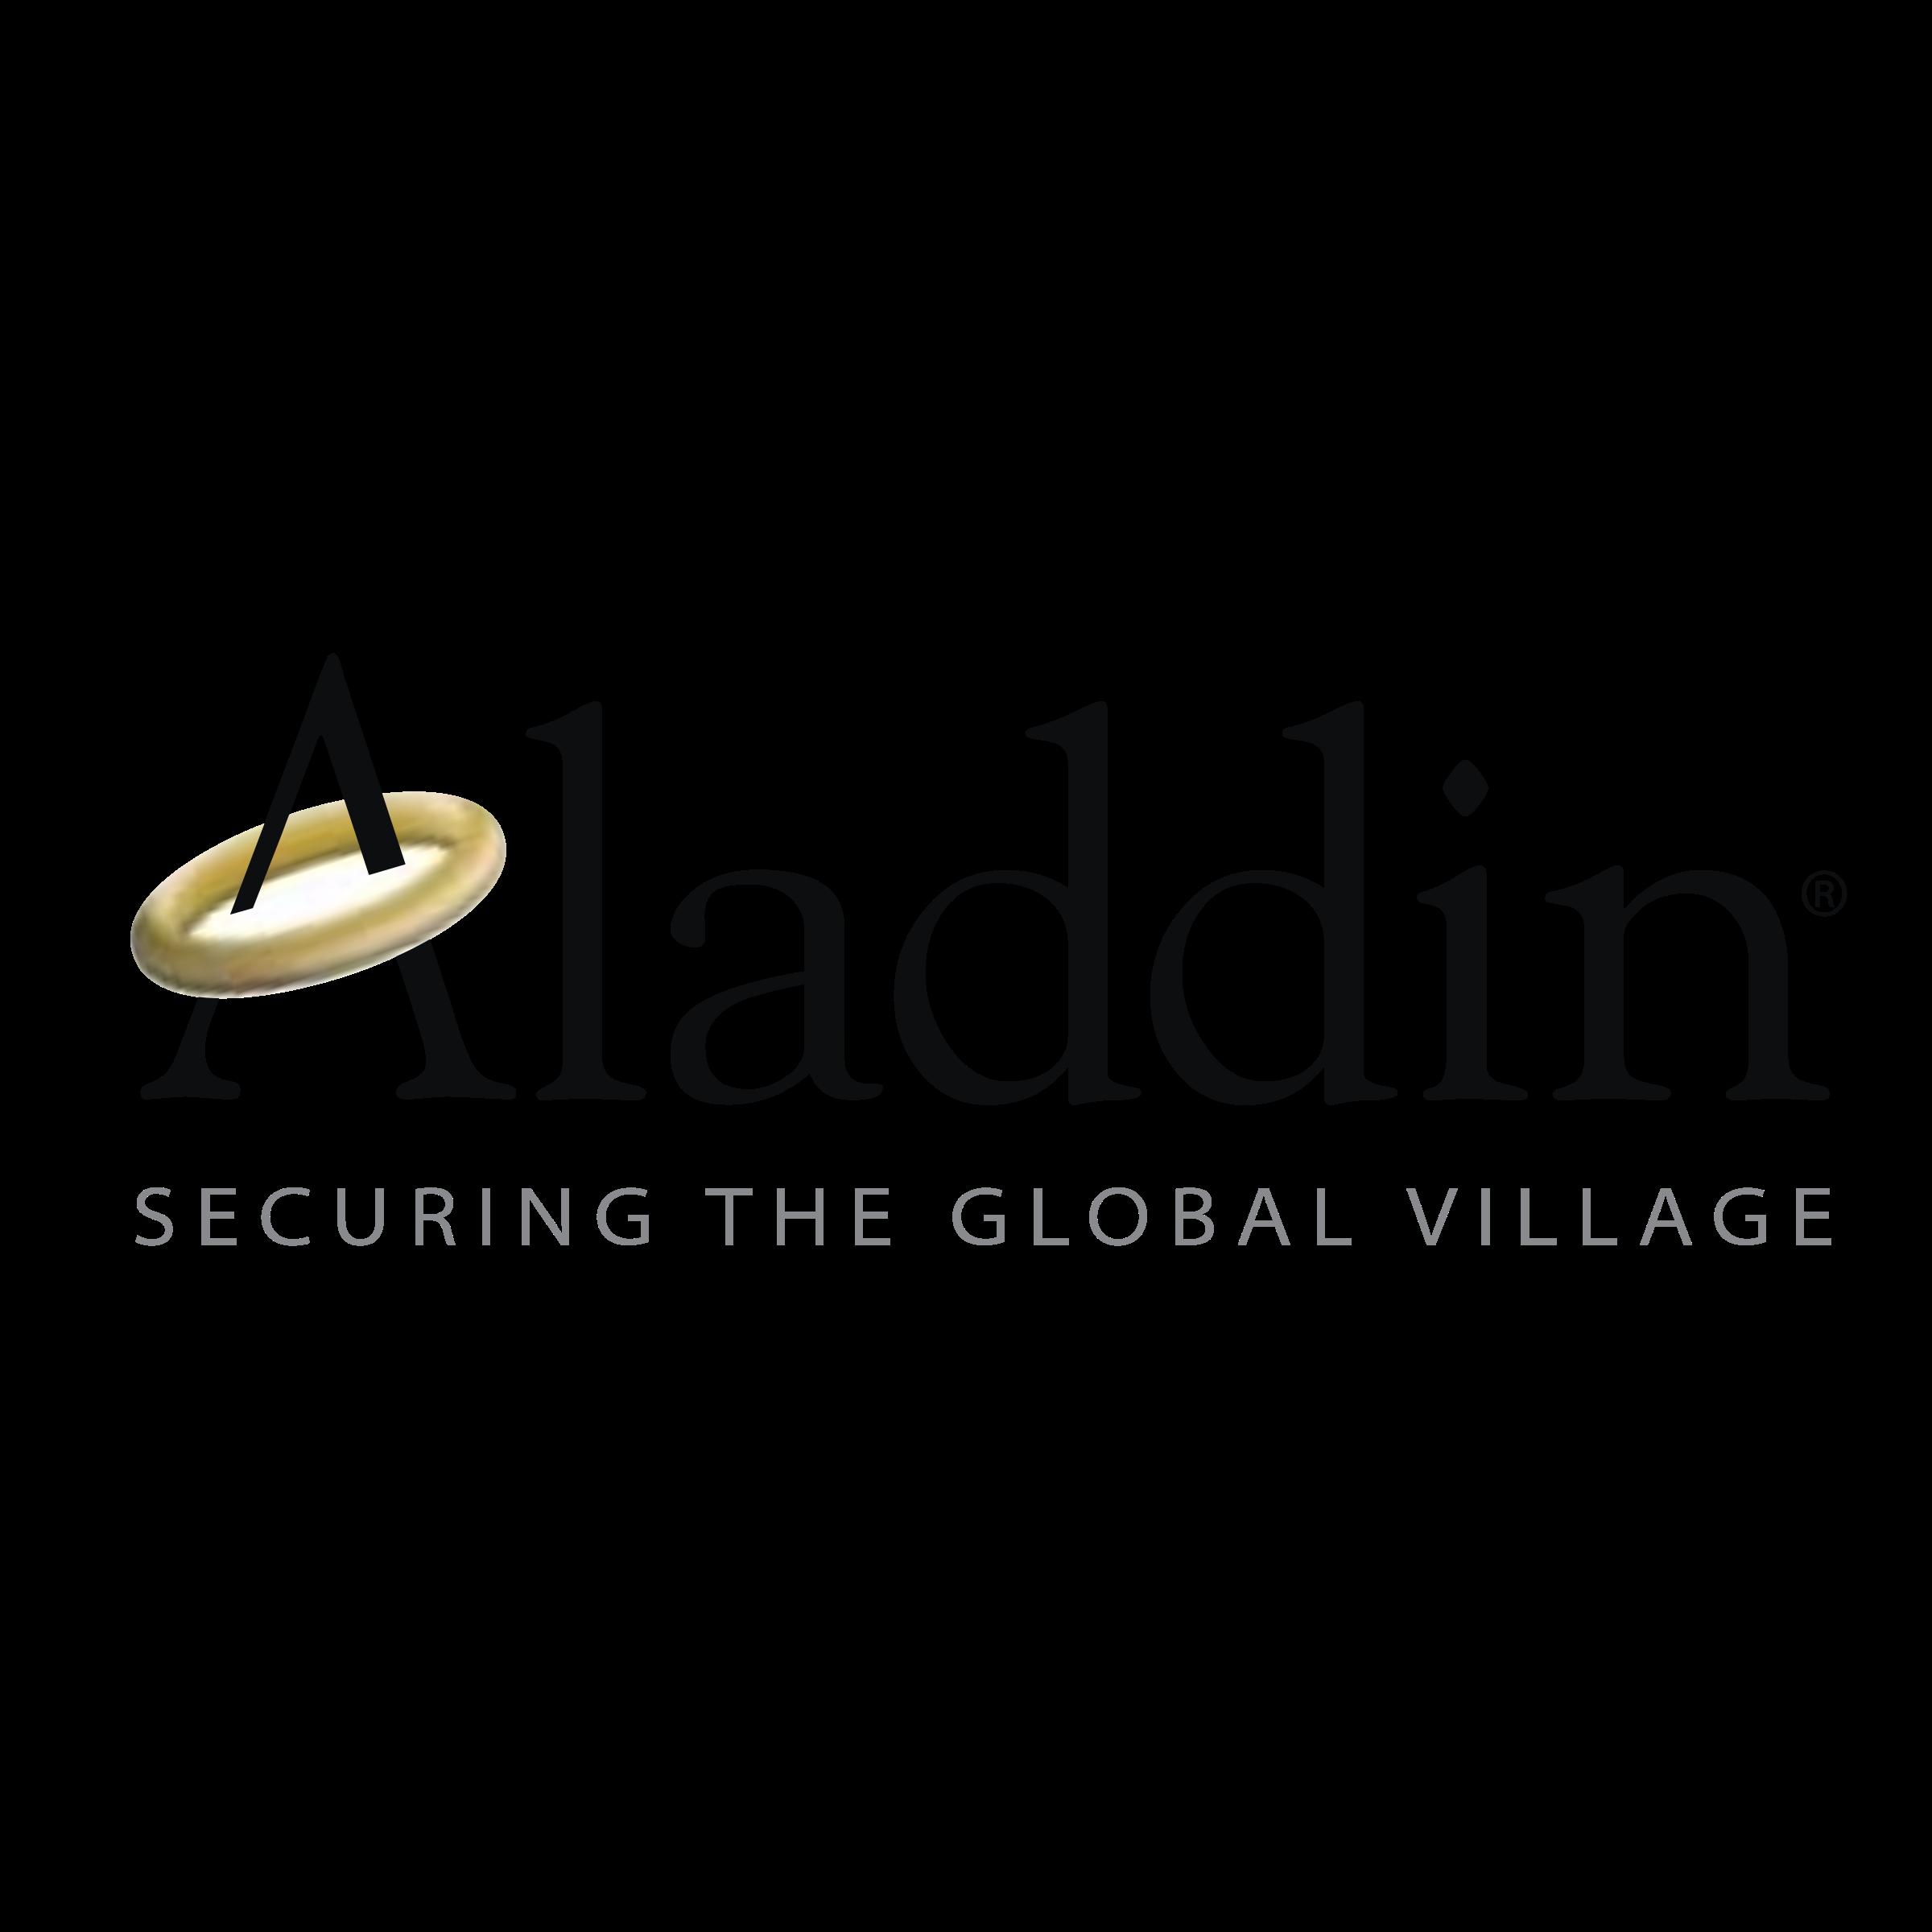 Aladdin Knowledge Systems 01 Logo PNG Transparent  for Aladdin Logo Vector  55nar